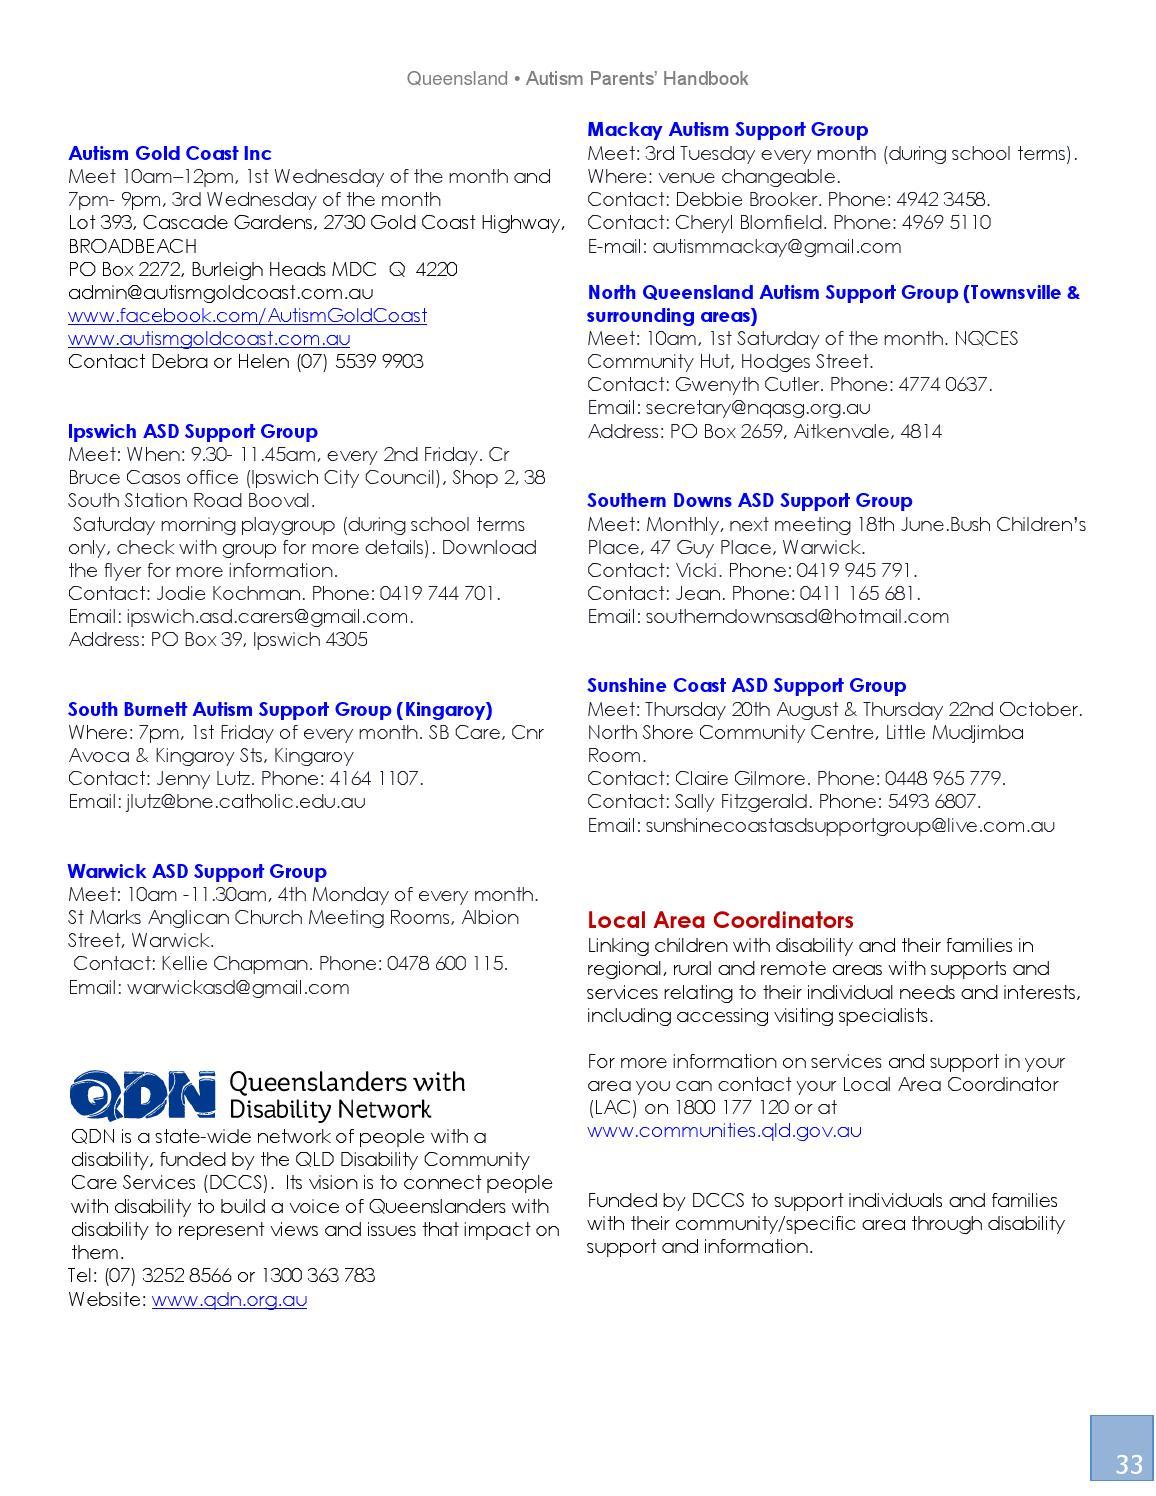 For Parents Of Autistic Kids 22nd >> Queensland Autism Parents Handbook 2015 By Autism World Magazine